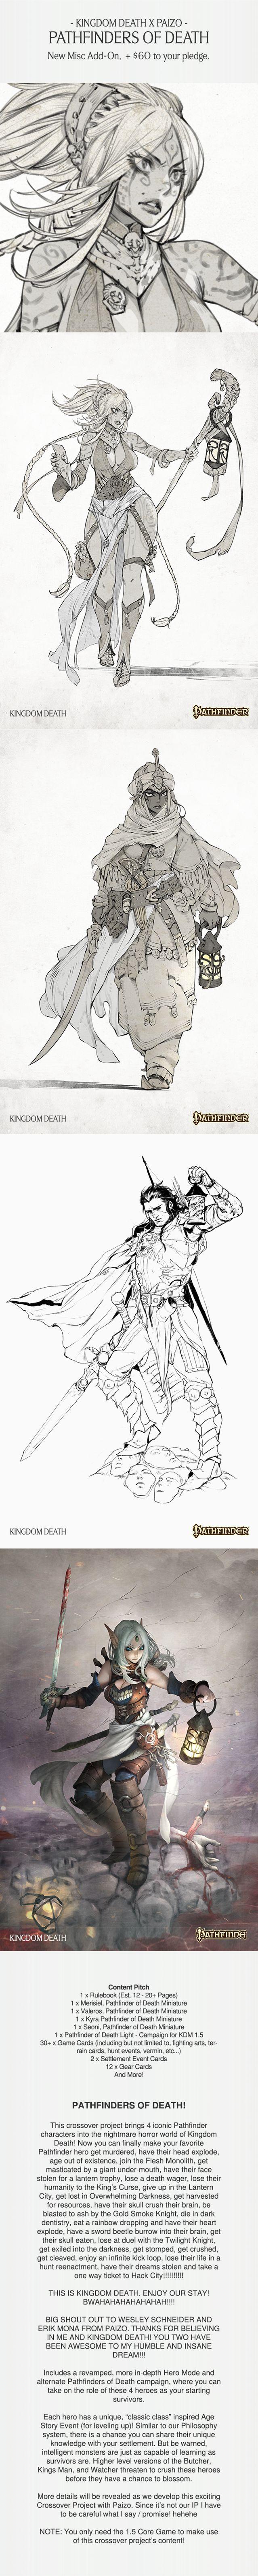 Kingdom Death: Monster 1.5 by Kingdom Death — Kickstarter Awesome Mark from Phantom's destruction